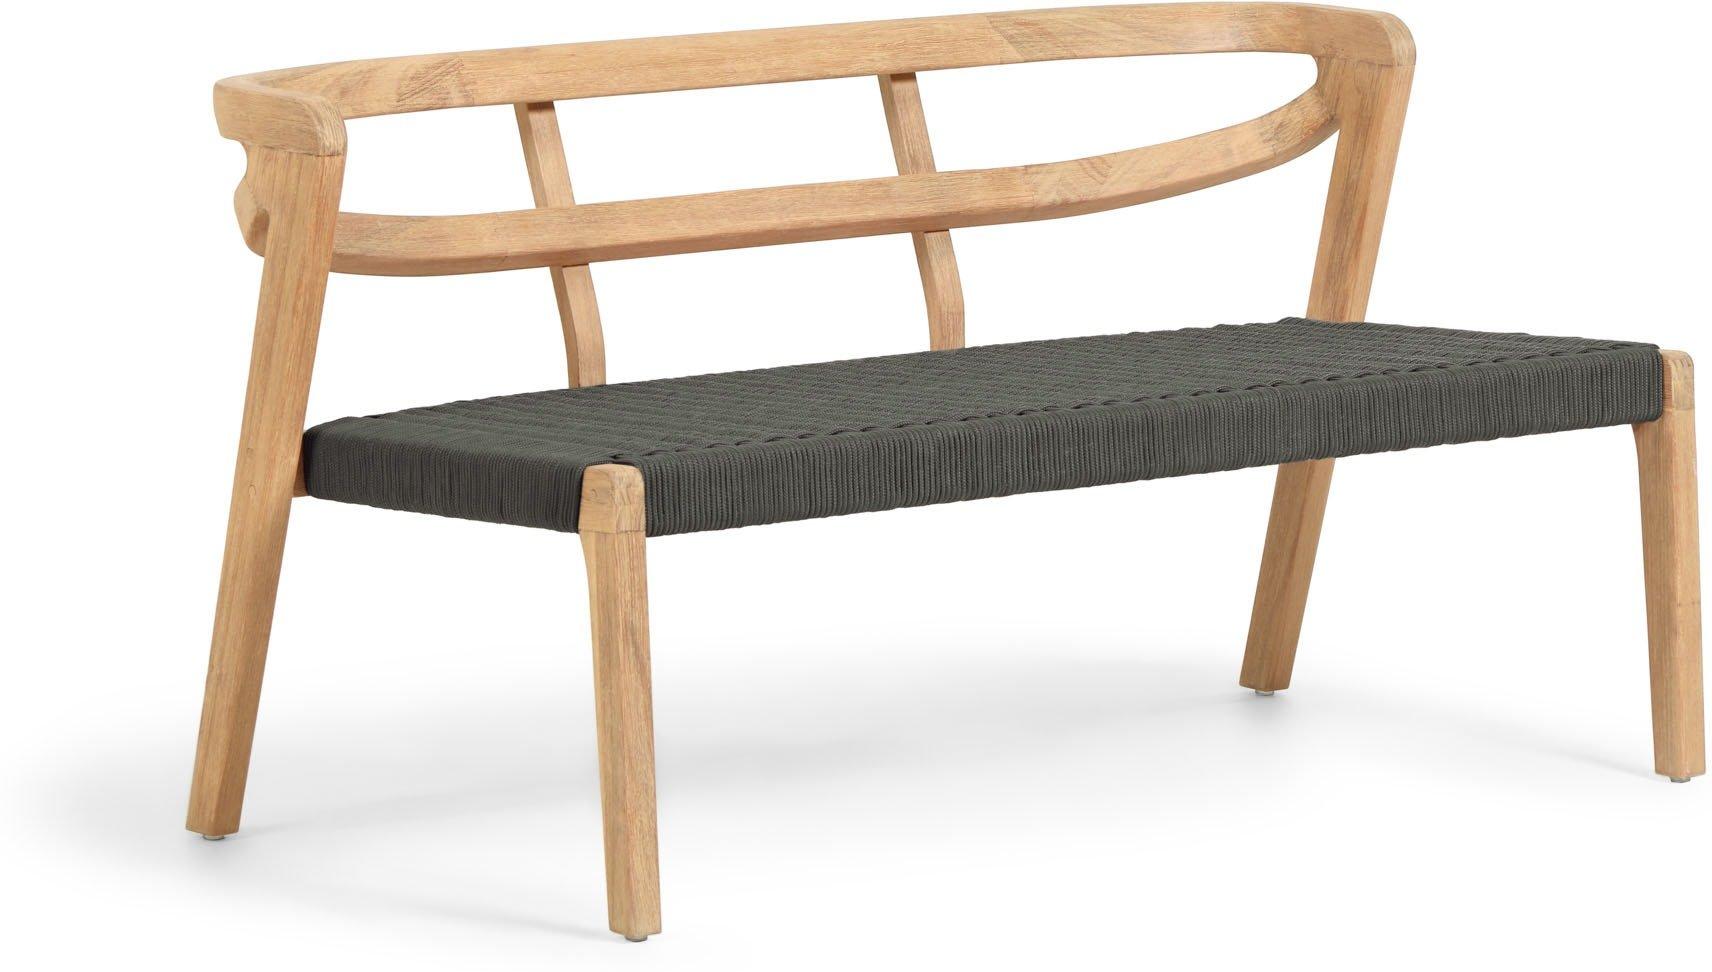 Ezilda, 3-personers sofa by LaForma (H: 65 cm. B: 122 cm. L: 62 cm., Grøn)